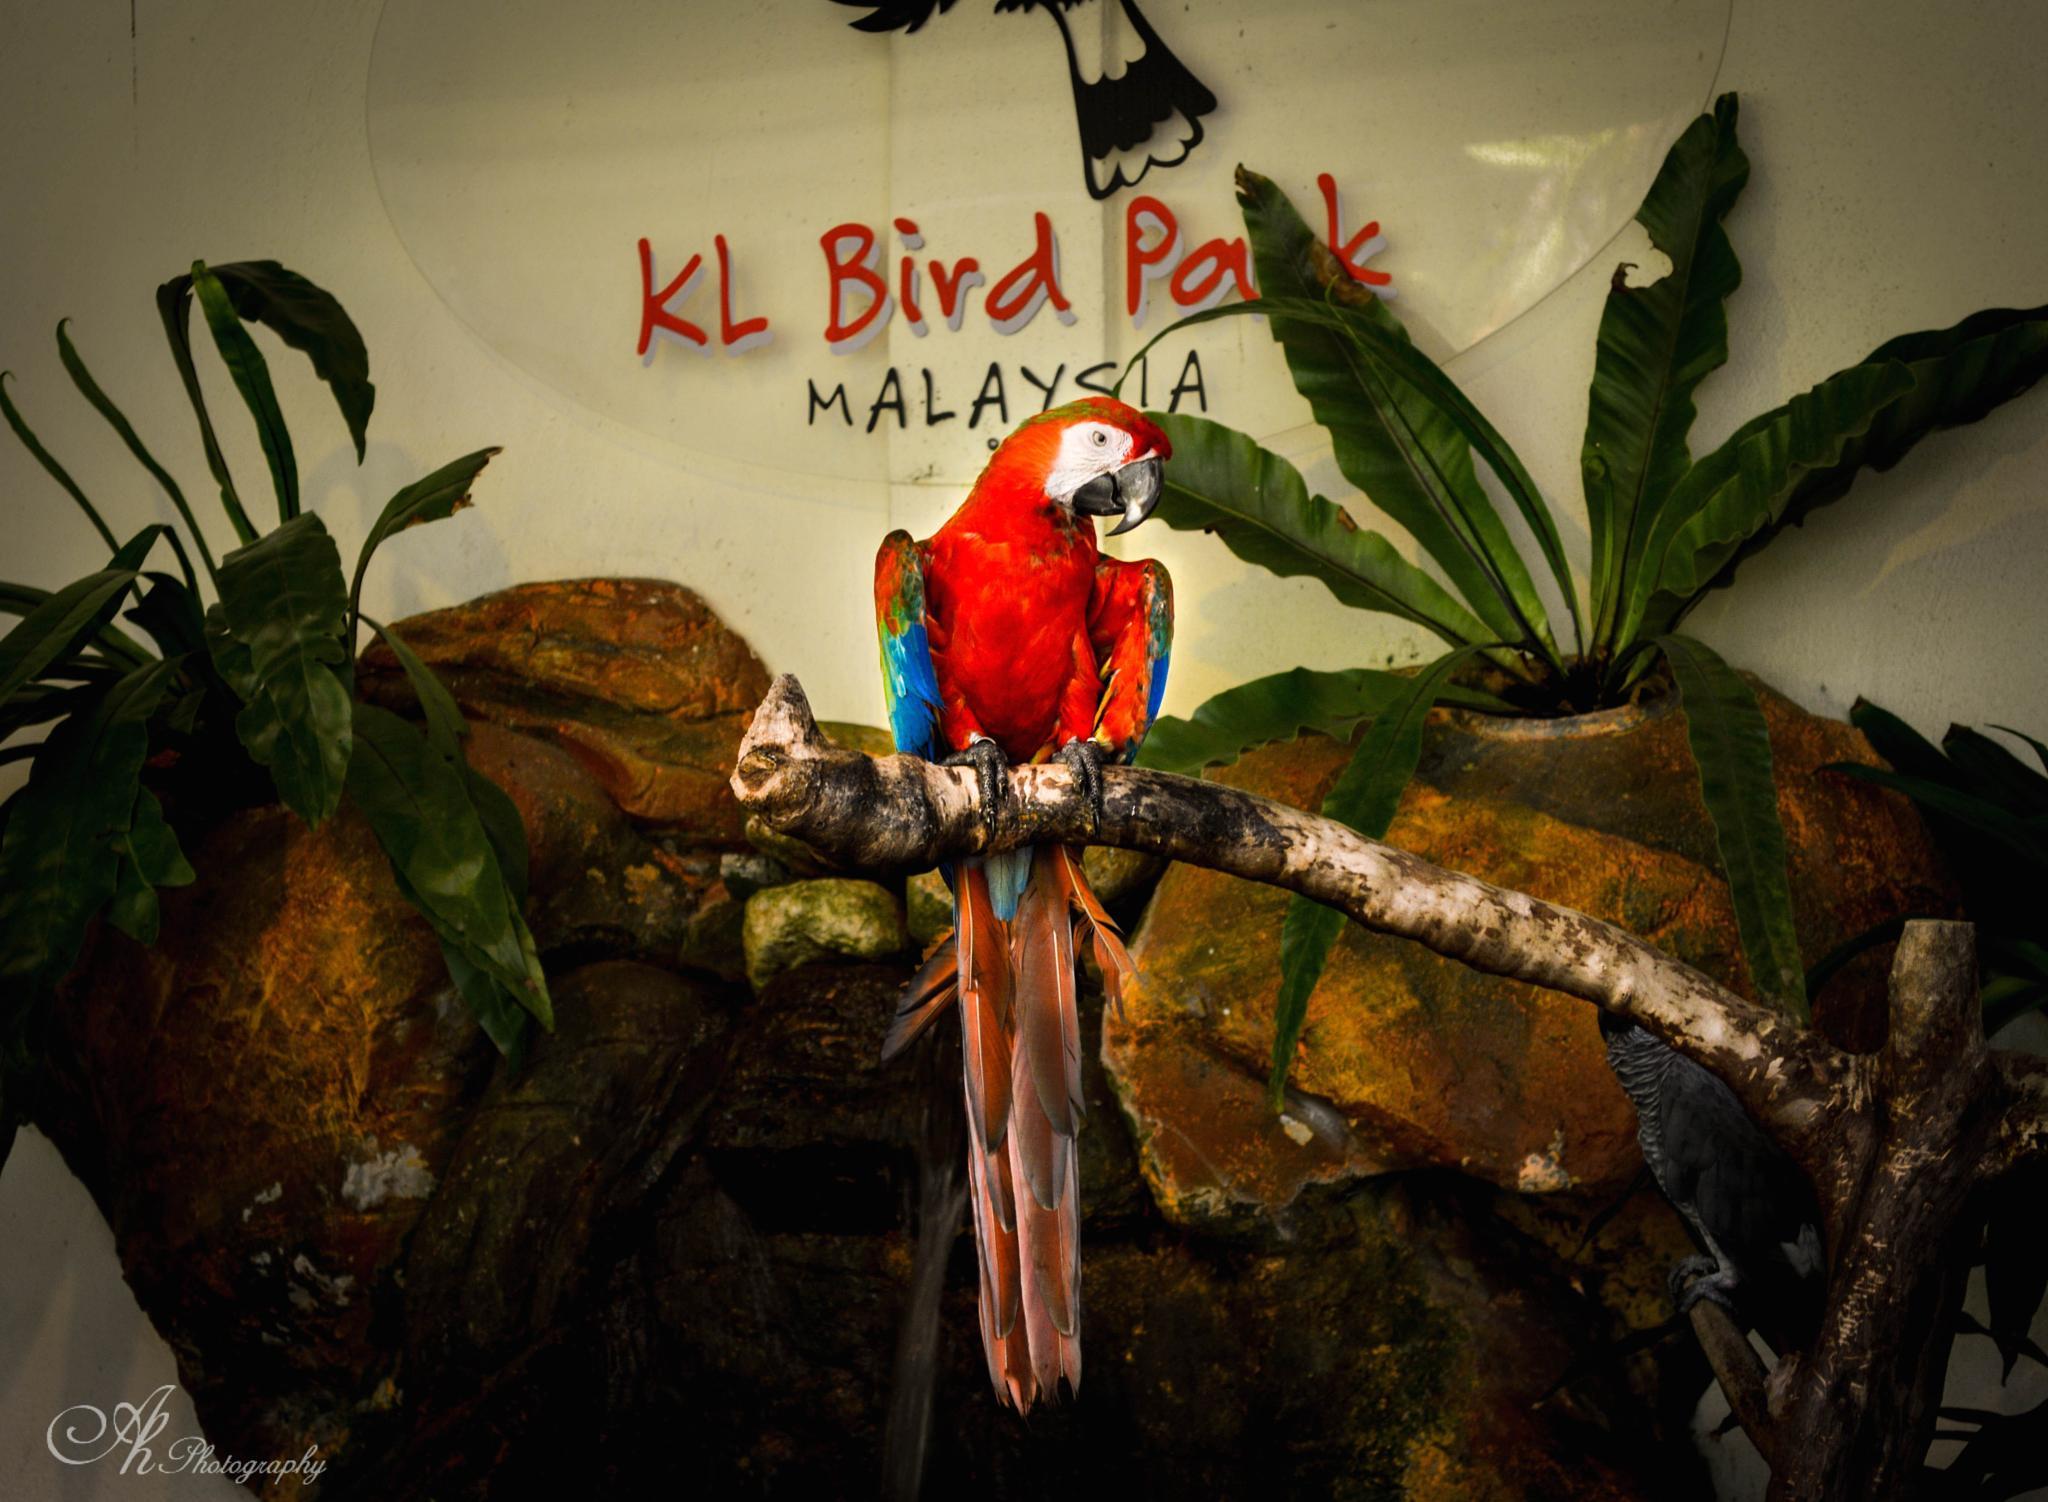 Red Rio @KL Bird Park by Anupam Hore